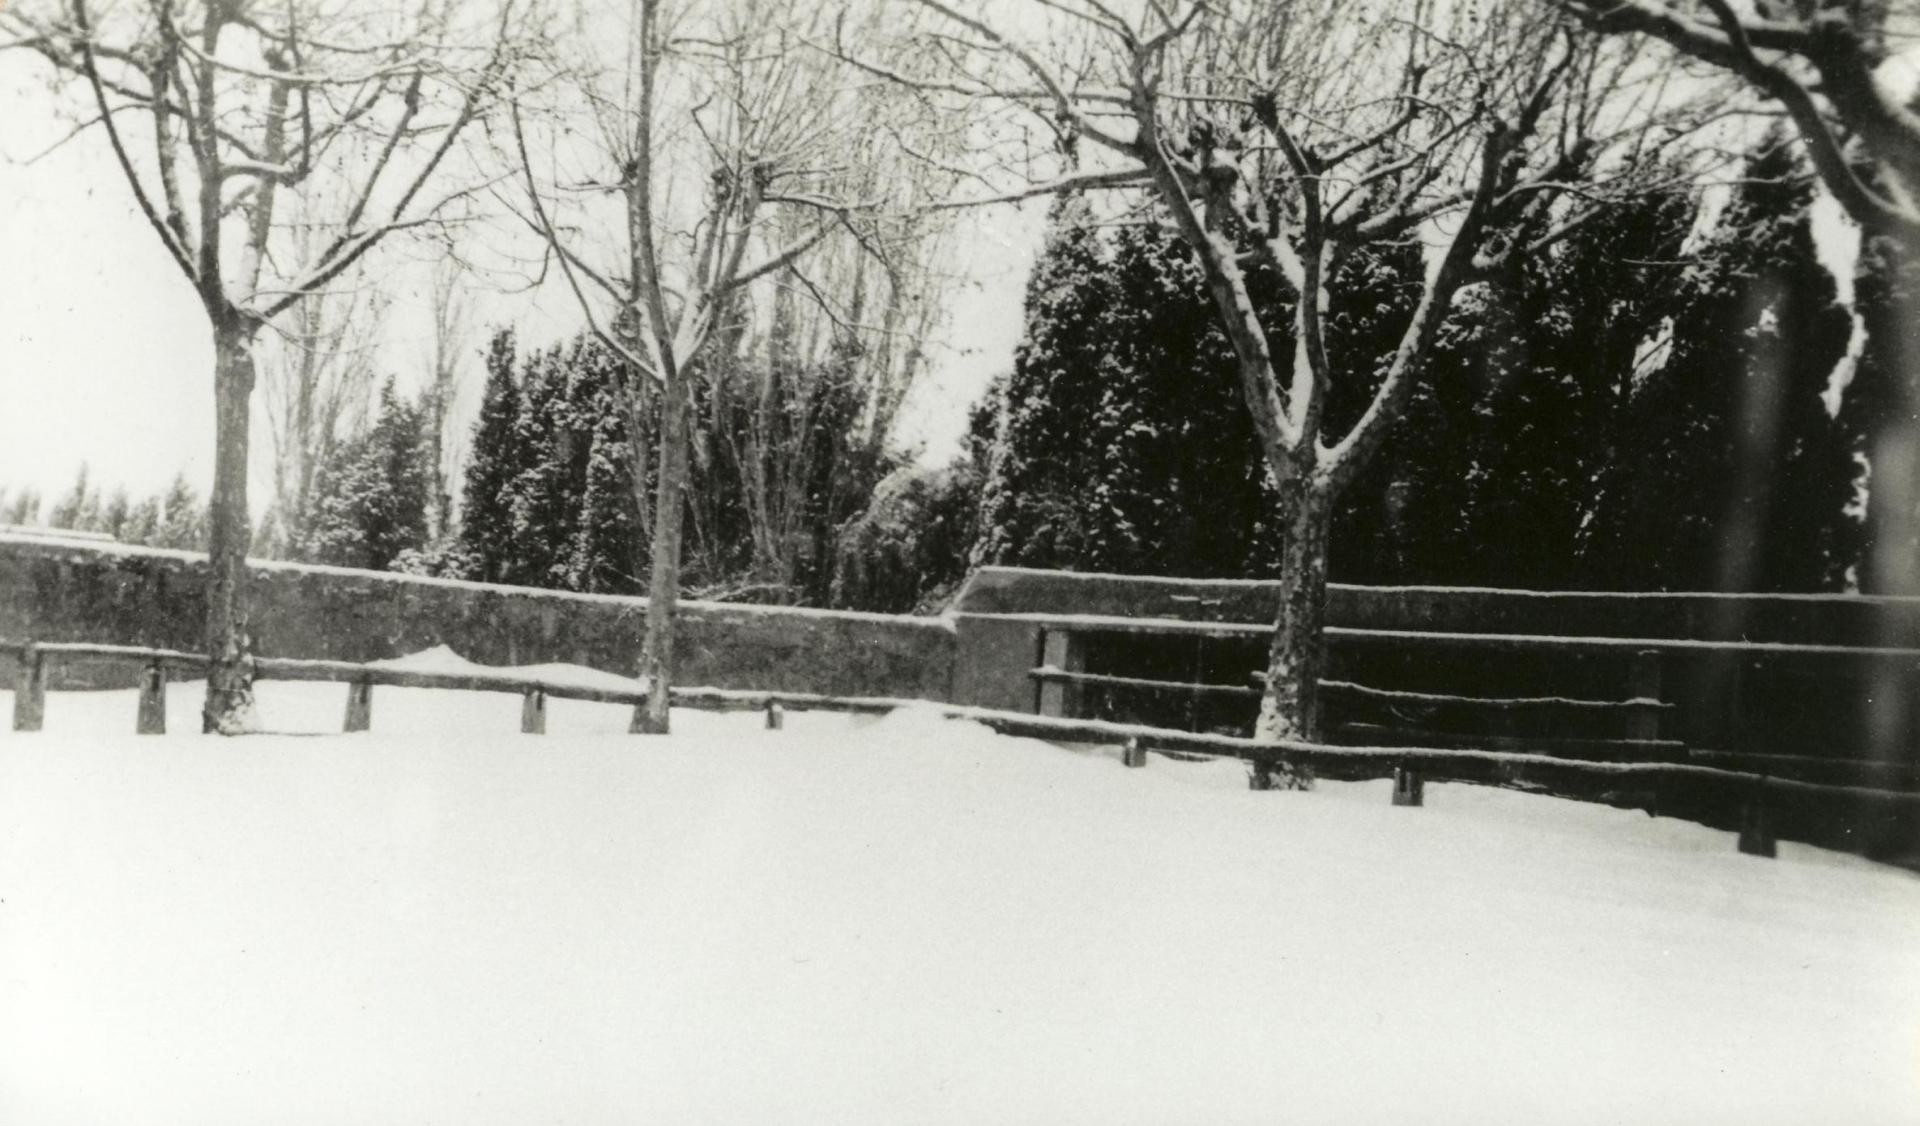 Arenes sous la neige en 1946